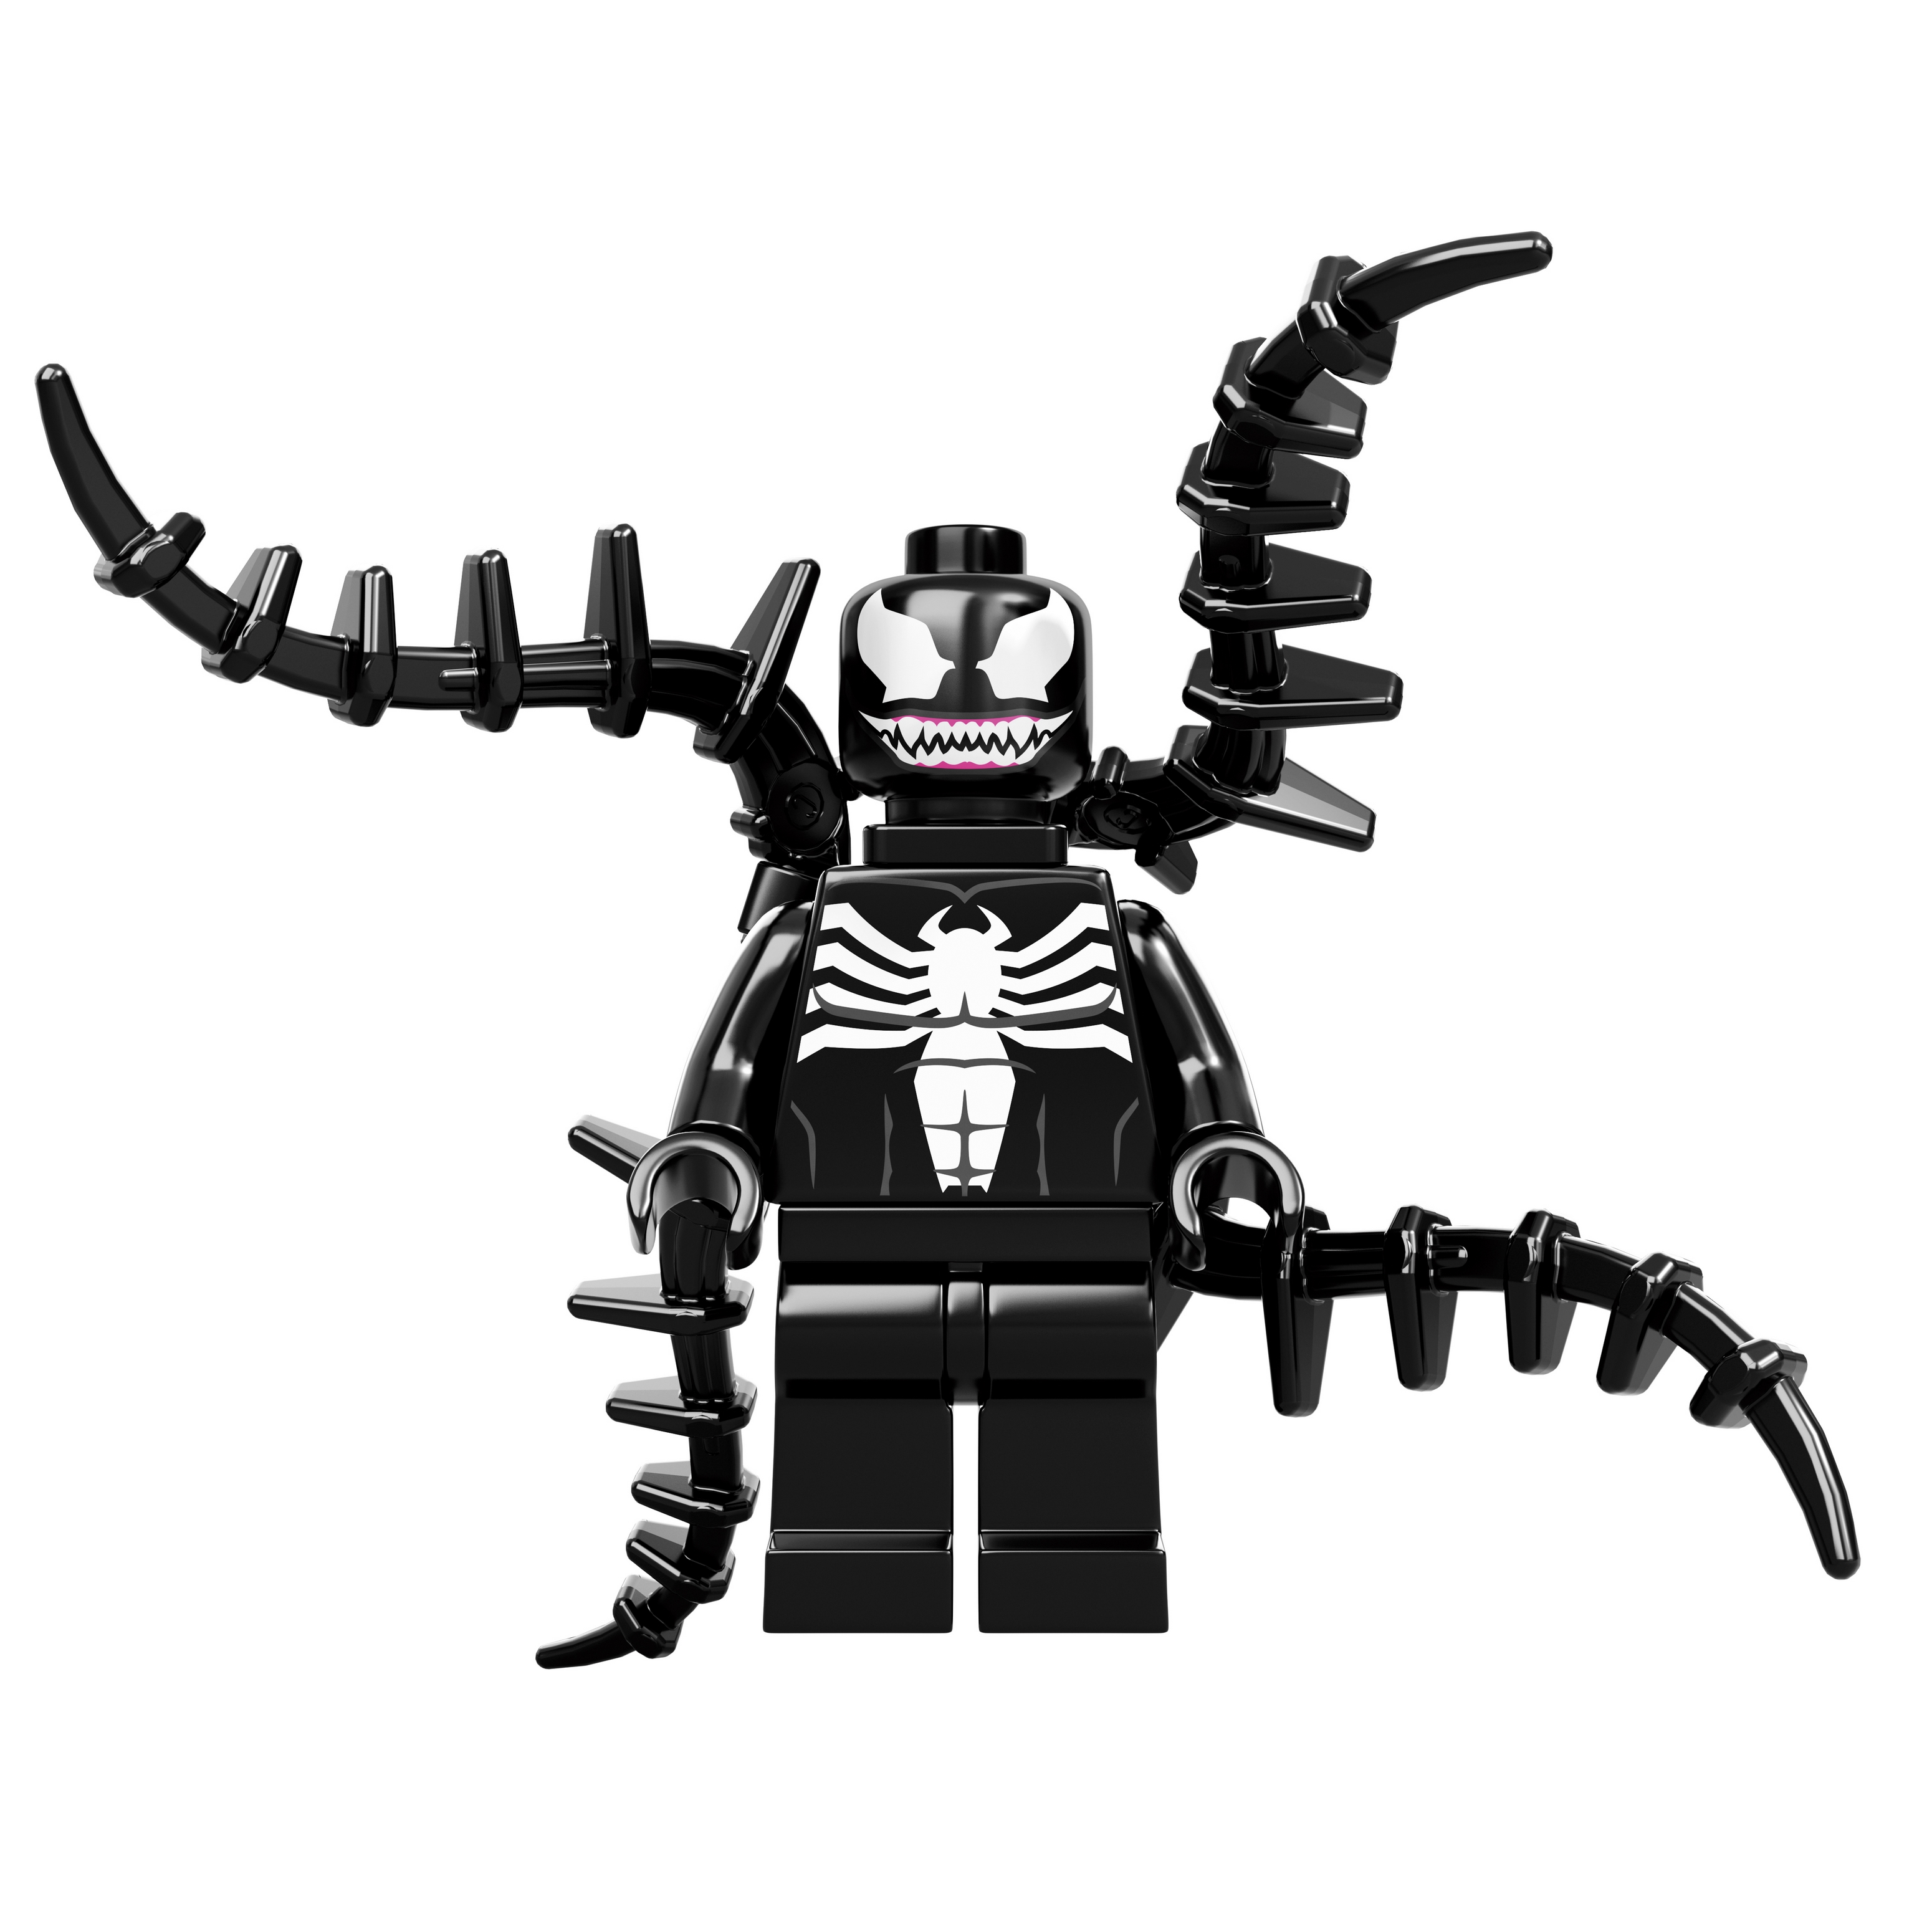 Coloriages A Imprimer Lego Numero 673413